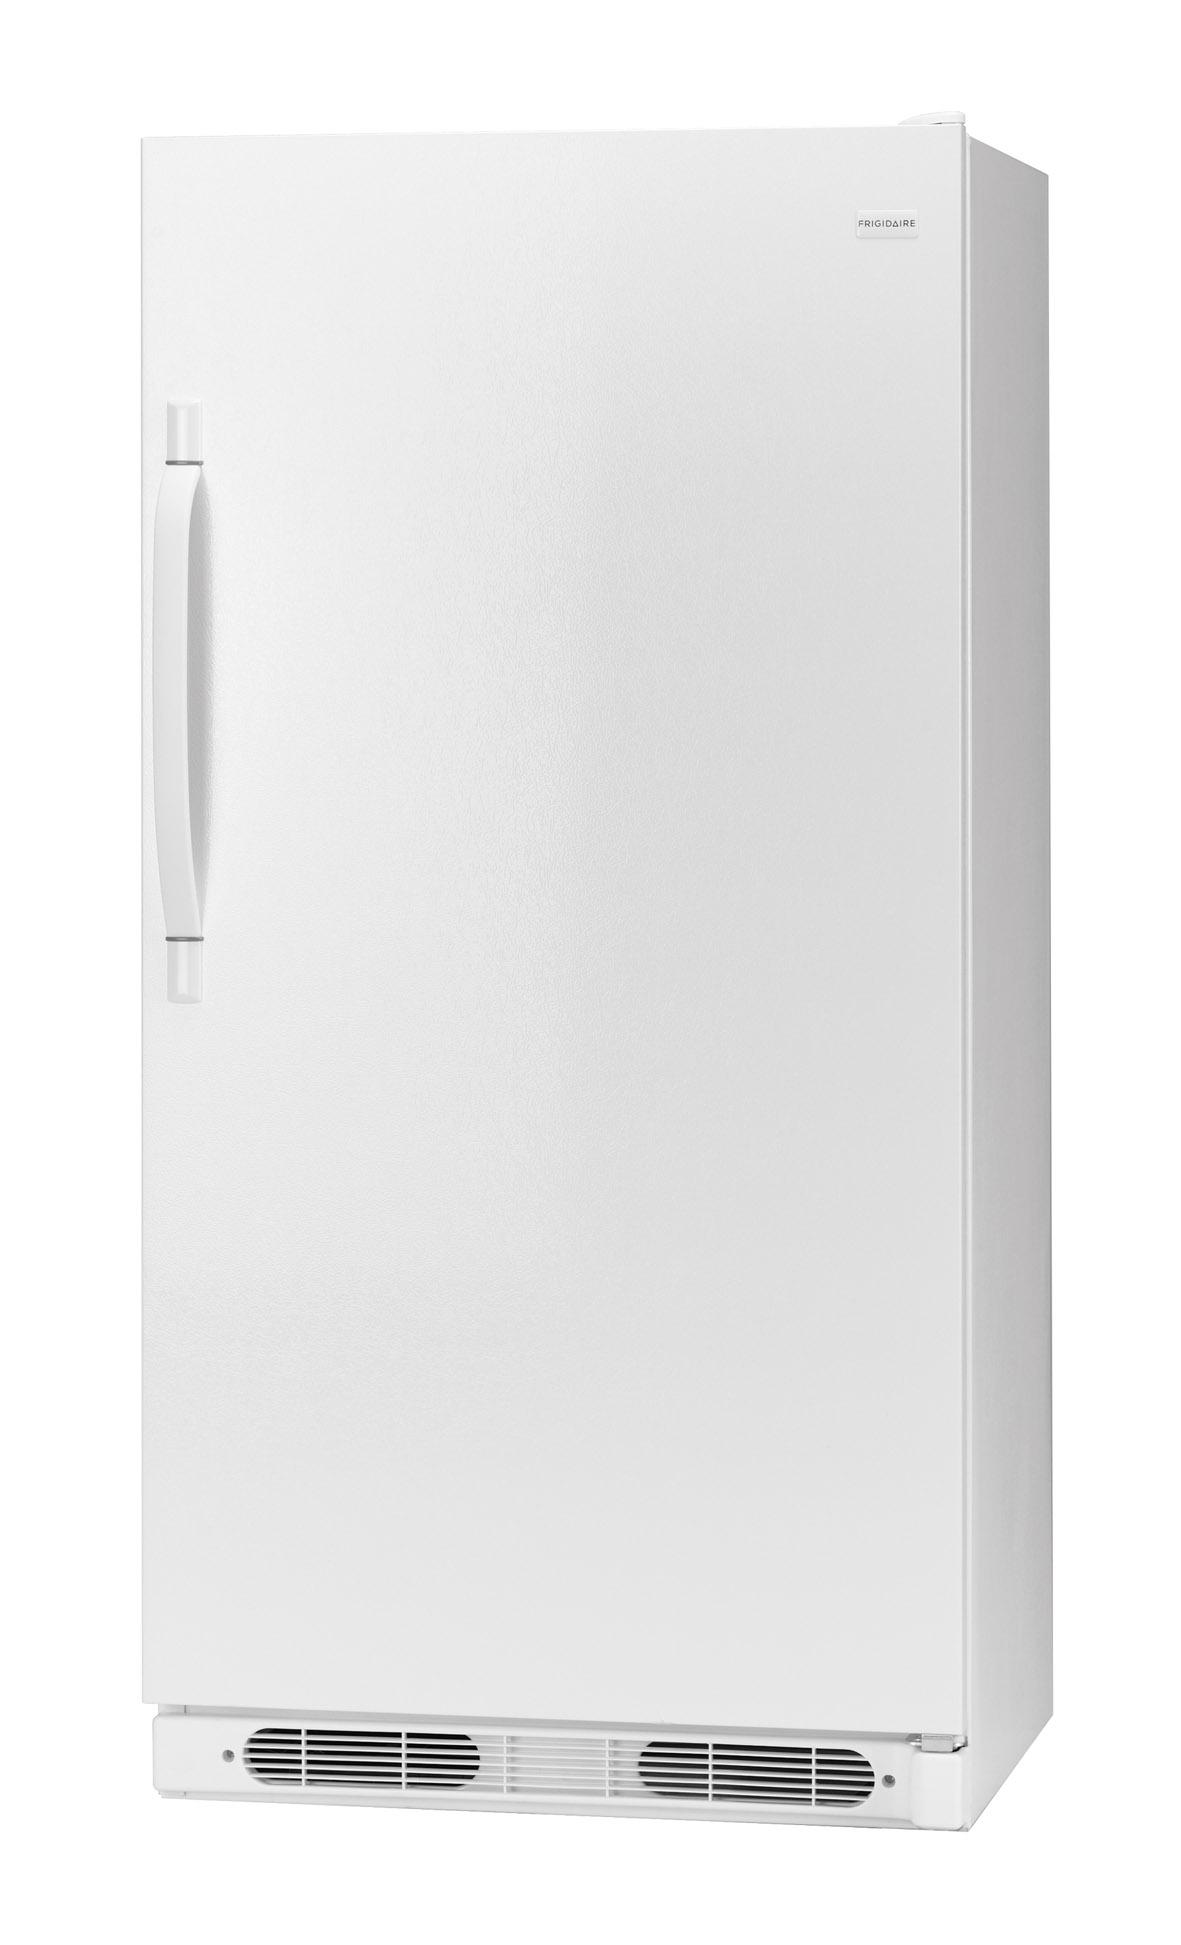 Frigidaire Refrigerator Model FRU17G4JW18 Parts